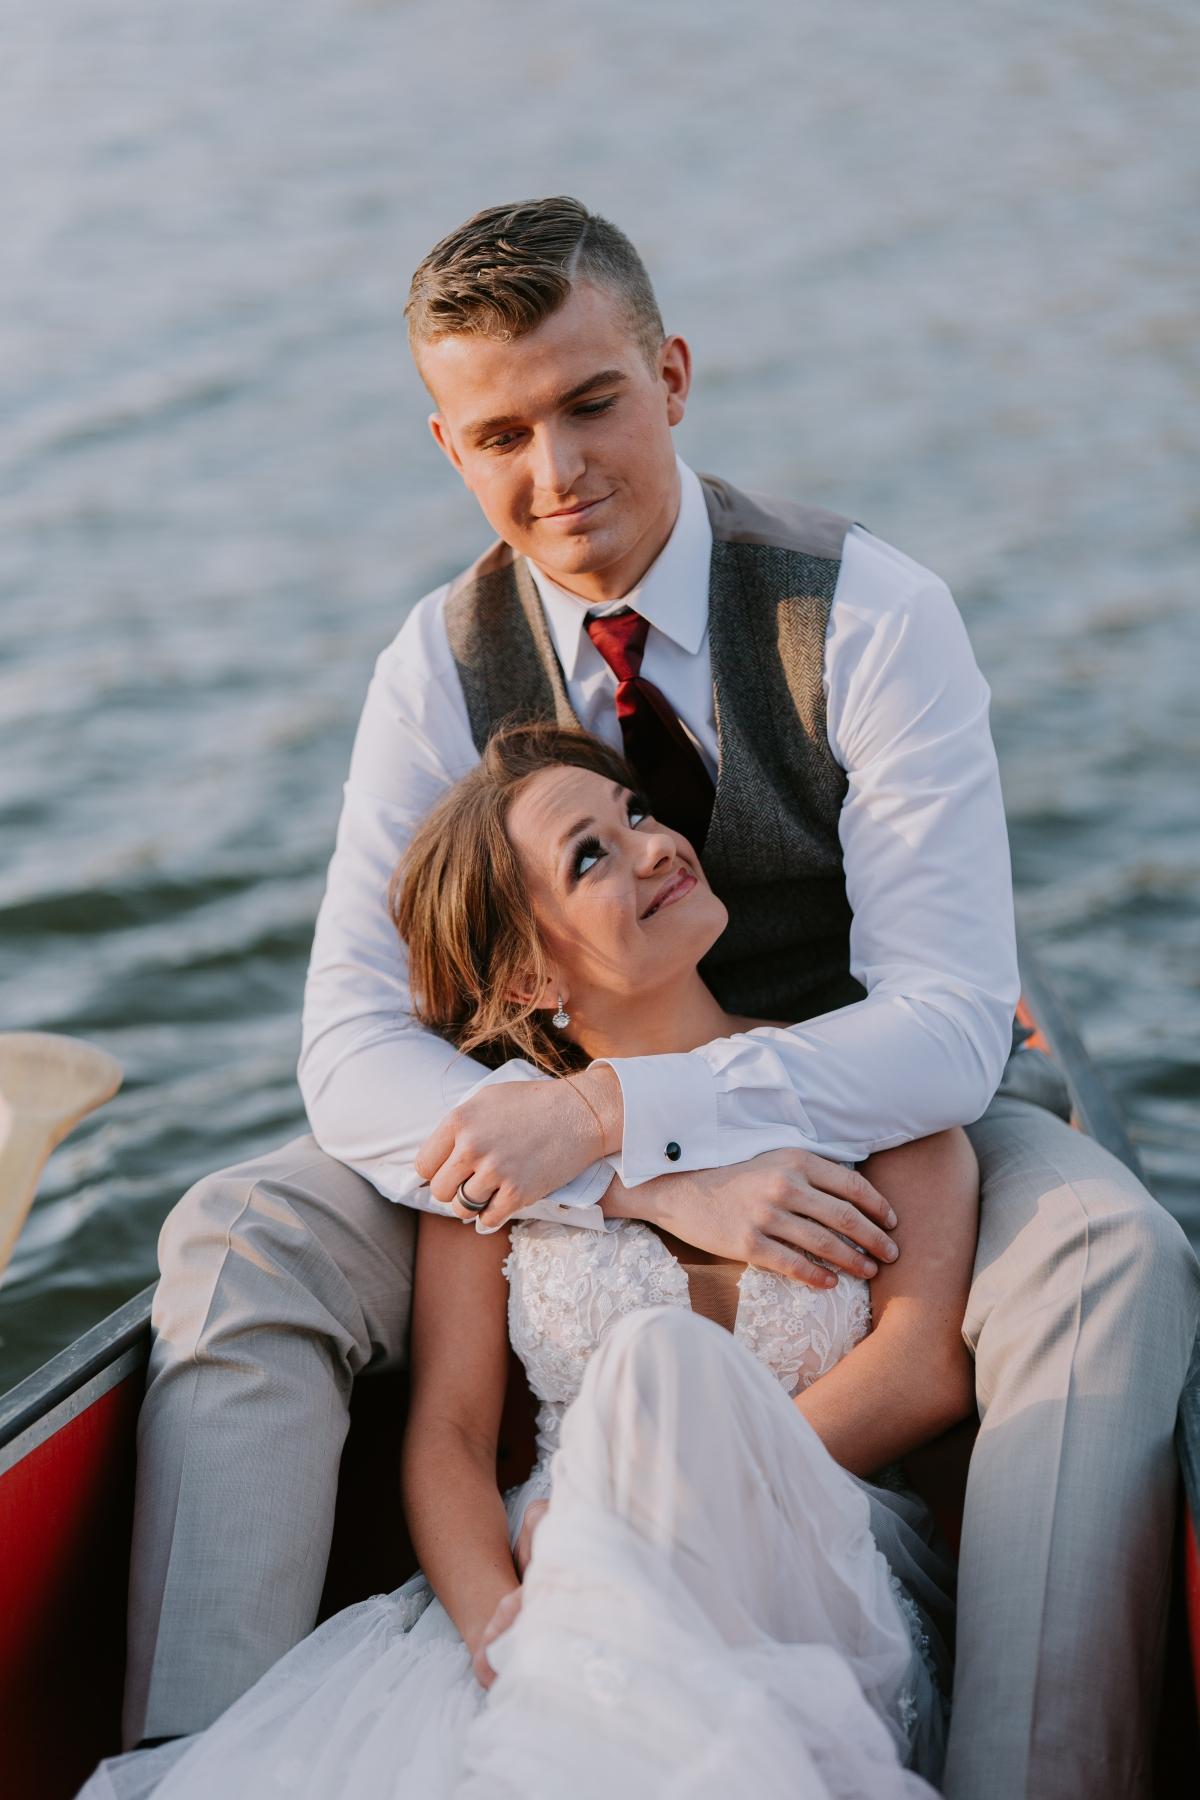 Millennium Moments Chicago Wedding Photographer 48